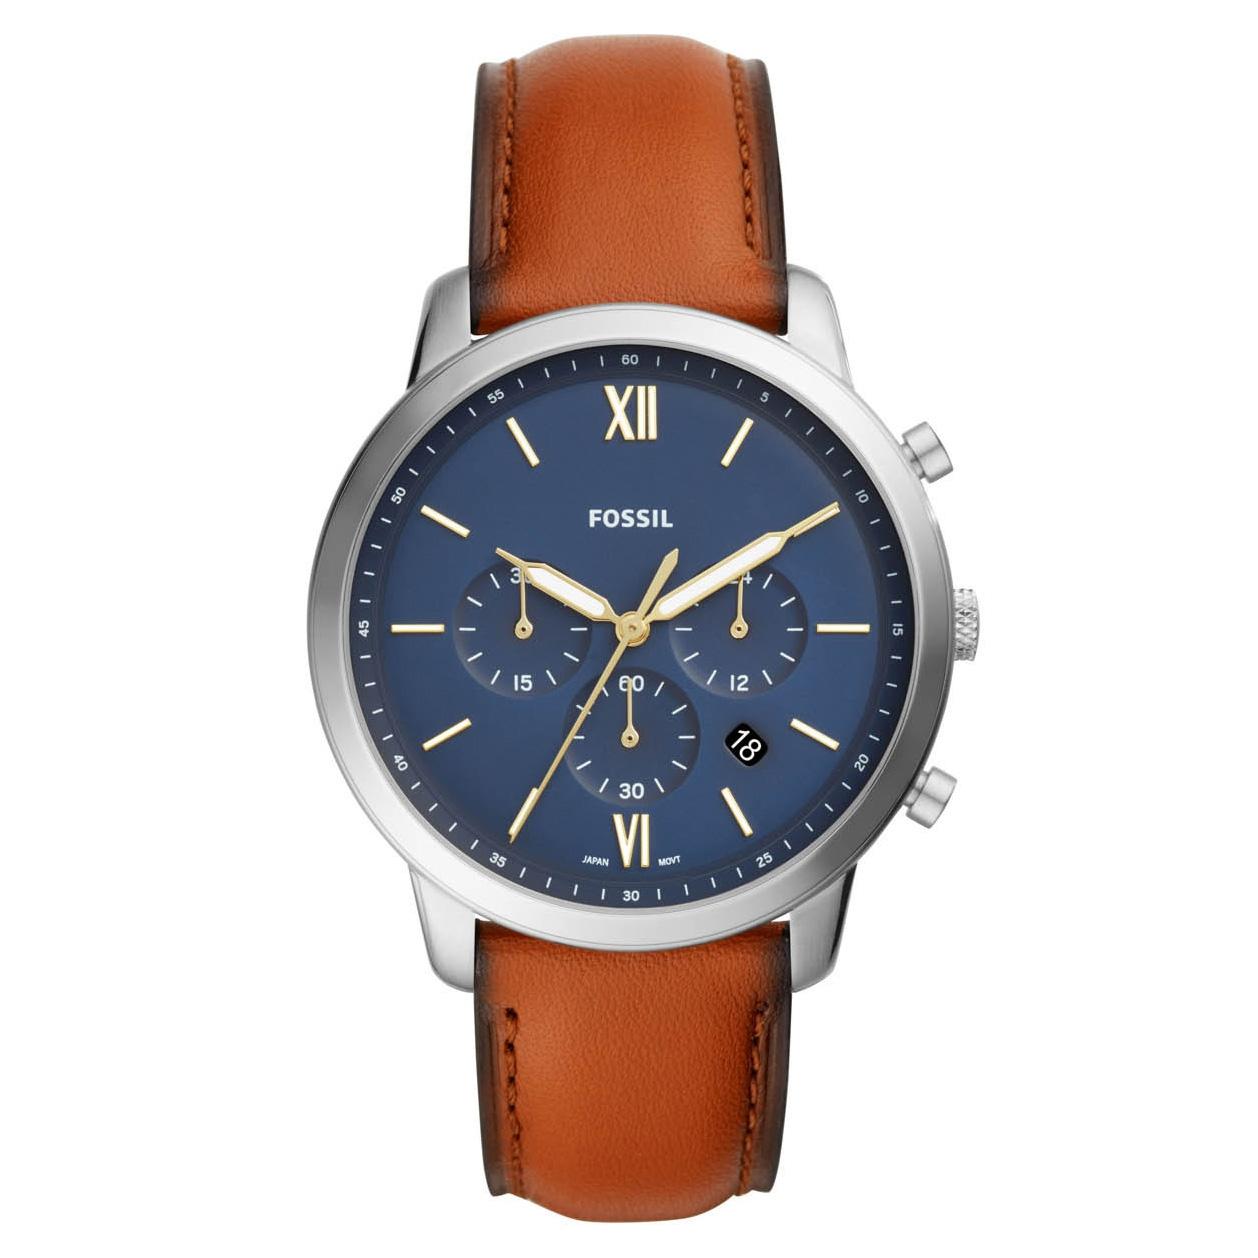 Fossil FS5453 Horloge Neutra Chrono zilverkleurig cognac 44 mm